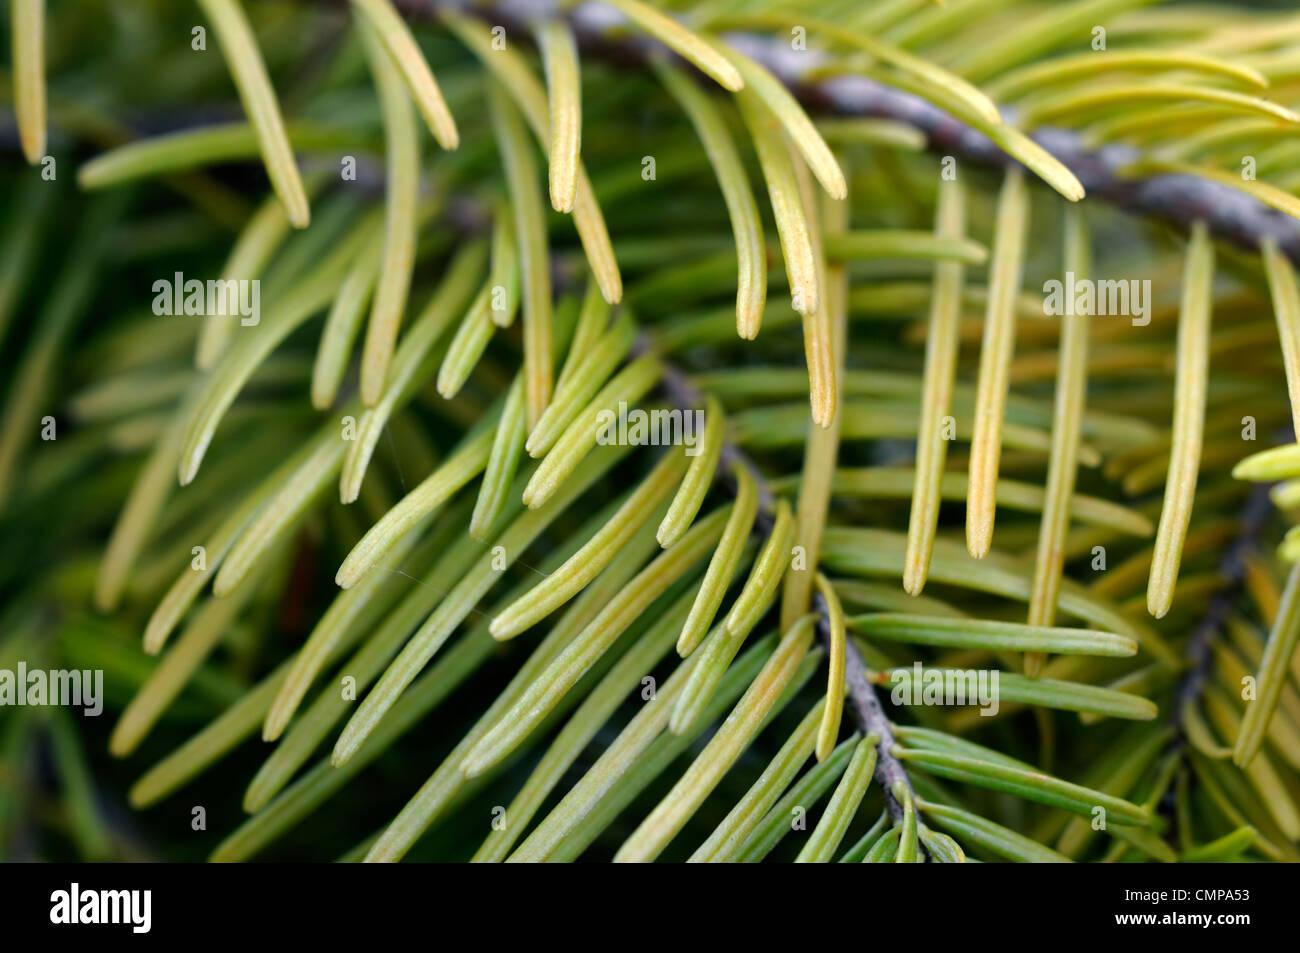 abies vilmorinii Vilmorin's Fir tree closeup green foliage leaves needles plant portraits conifers evergreens - Stock Image